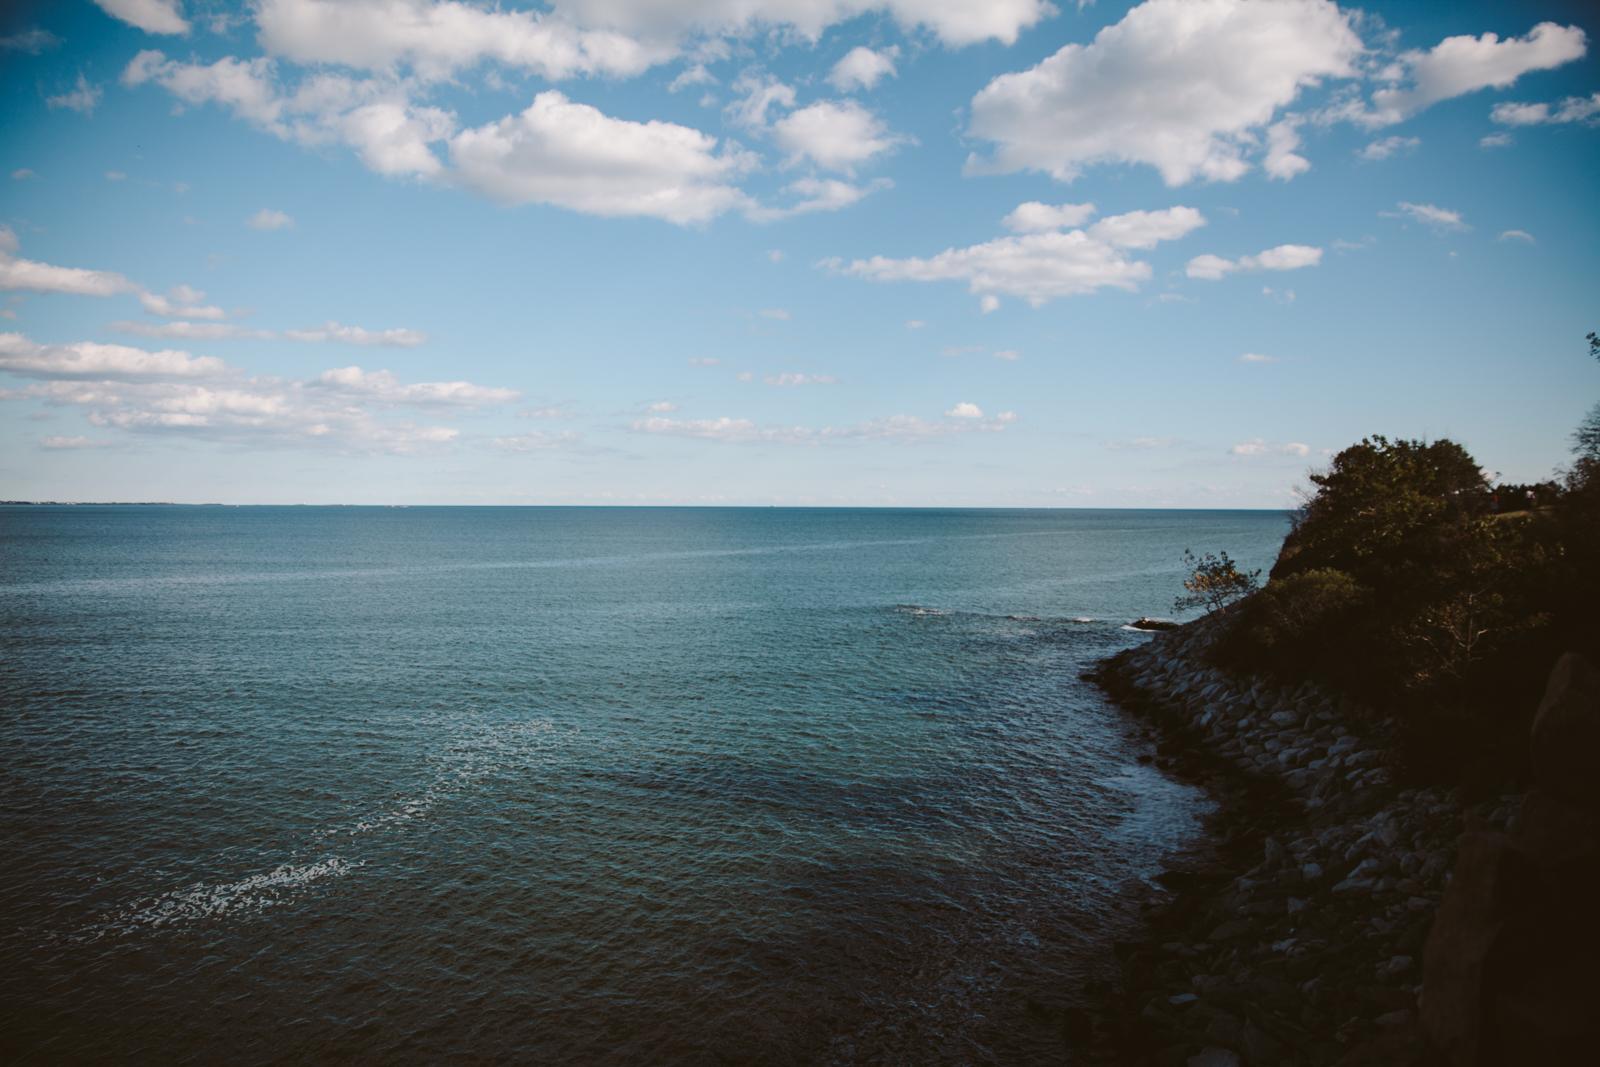 Eastons-Beach-Rotunda-Ballroom-Wedding-Newport-Rhode-Island-PhotographybyAmandaMorgan-54.jpg